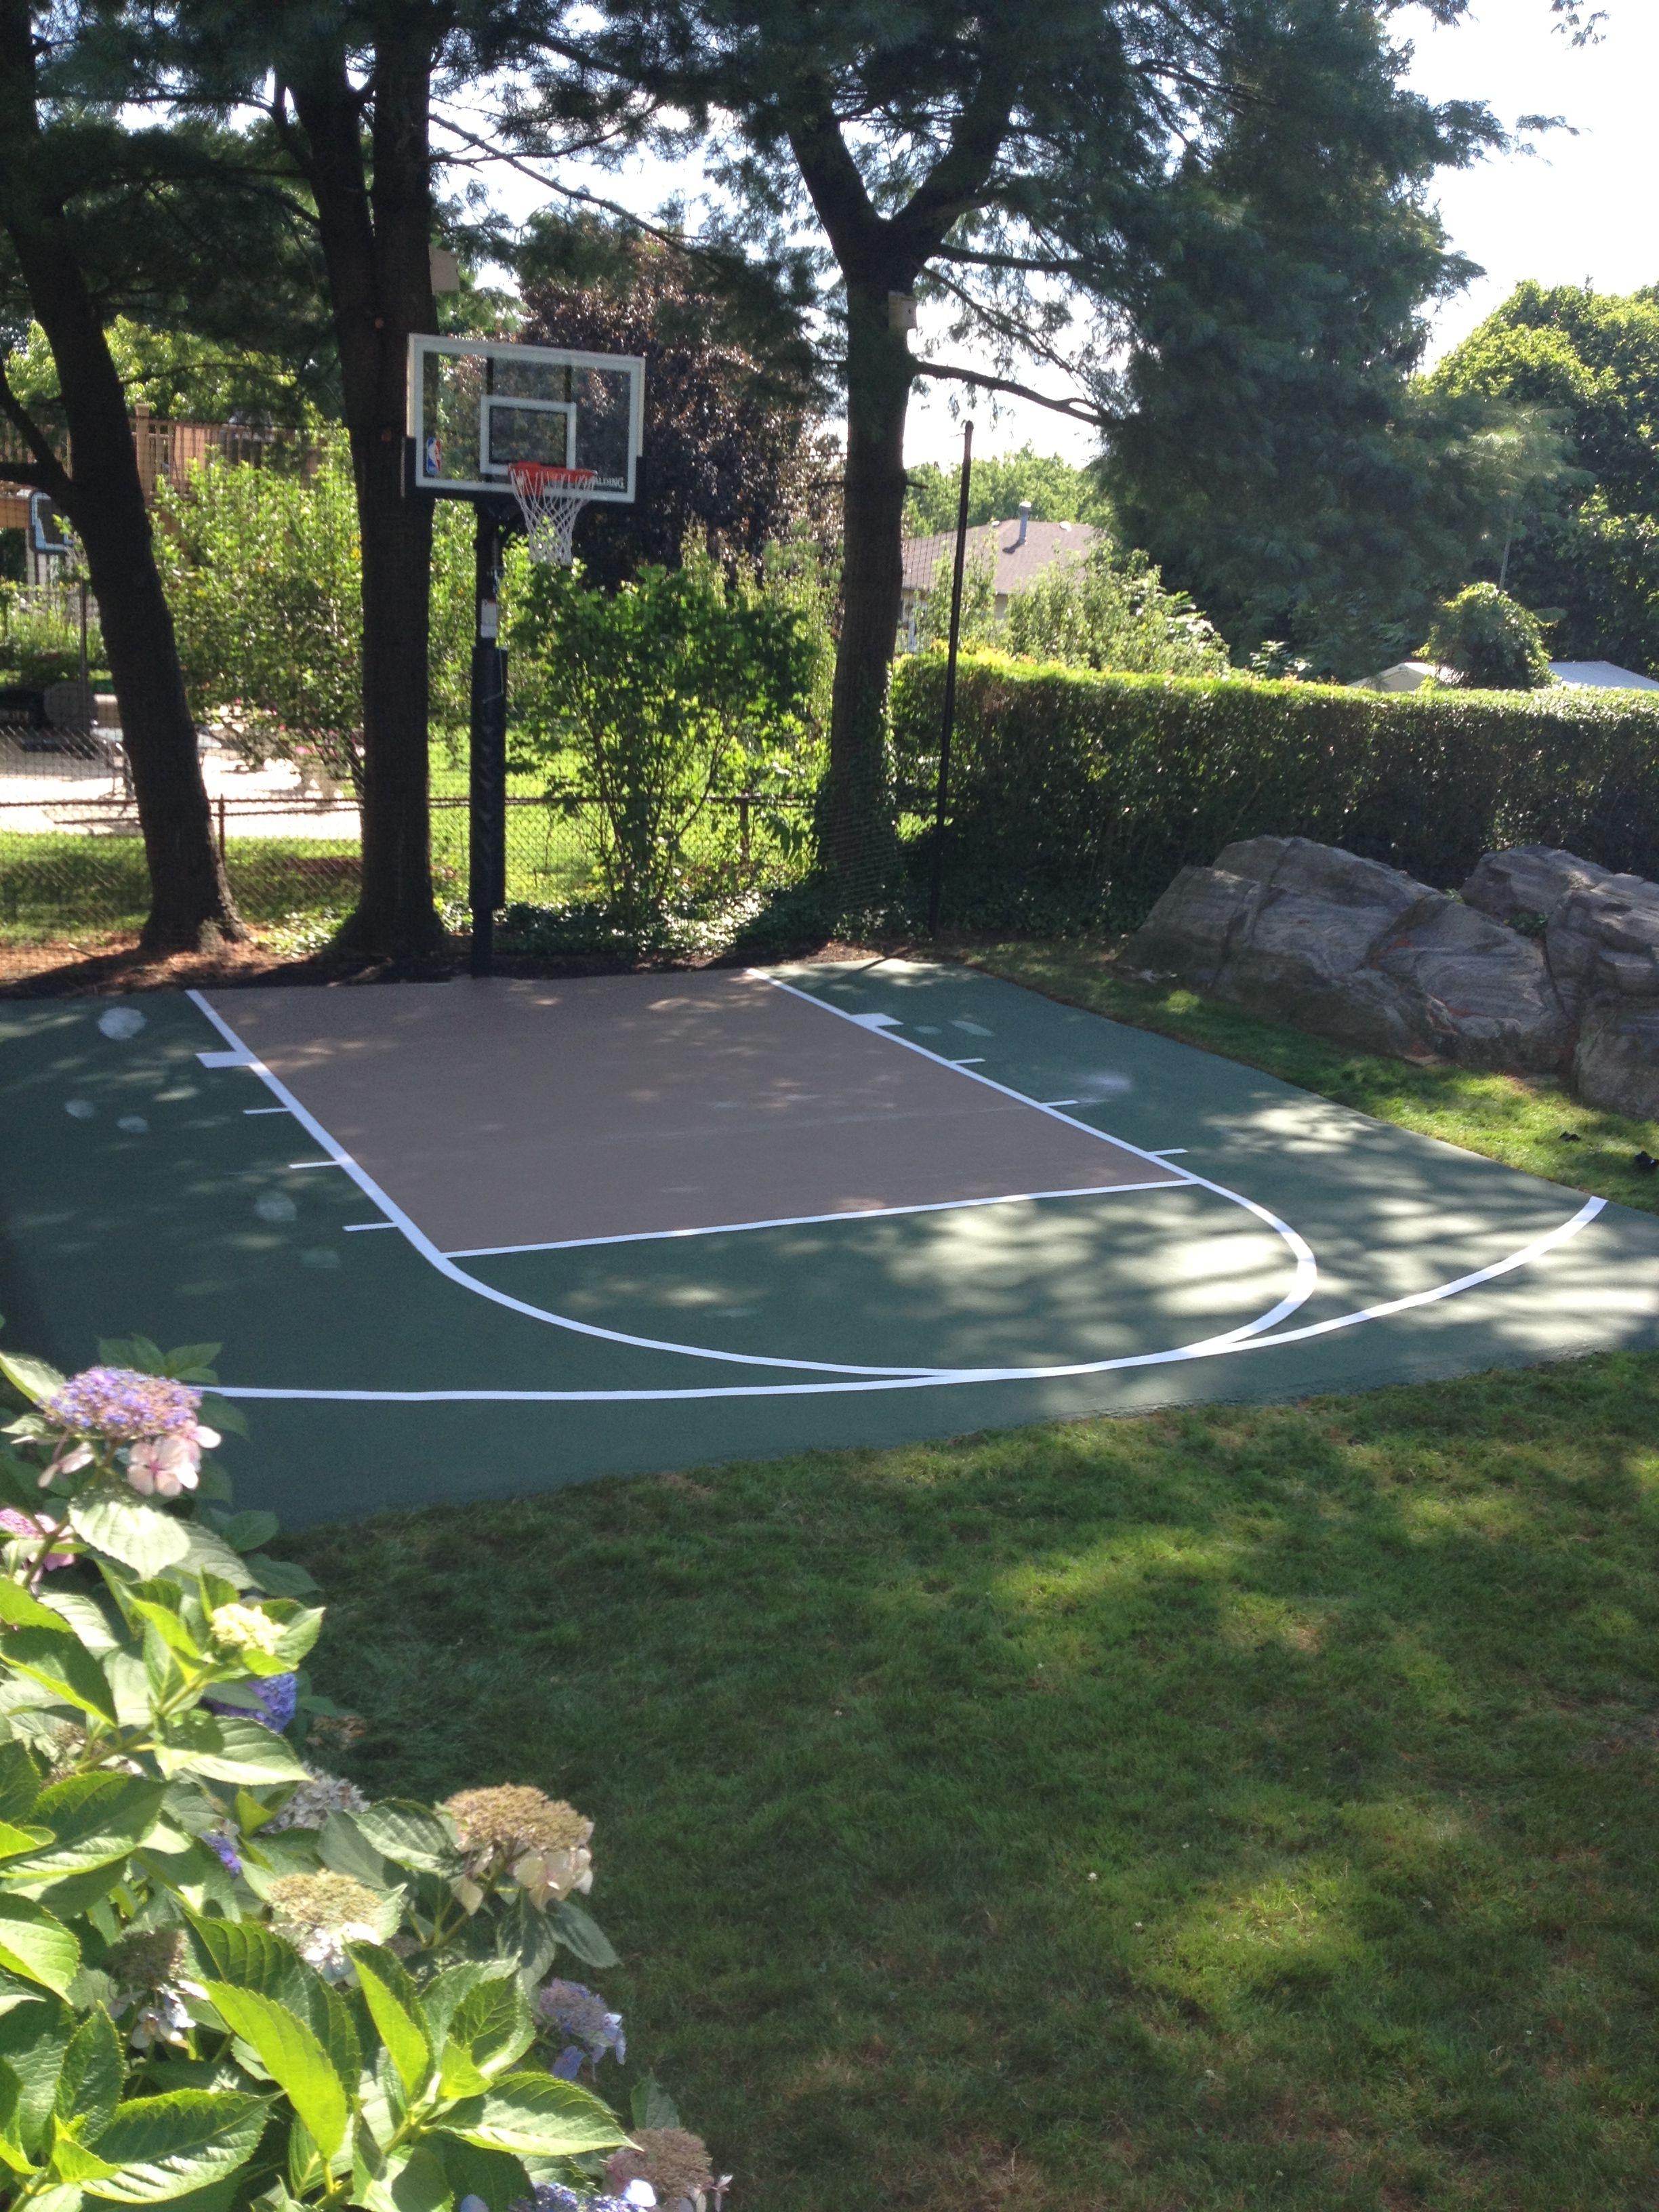 Stones At Courtside Backyard Basketball Small Backyard Landscaping Backyard landscaping ideas with basketball court